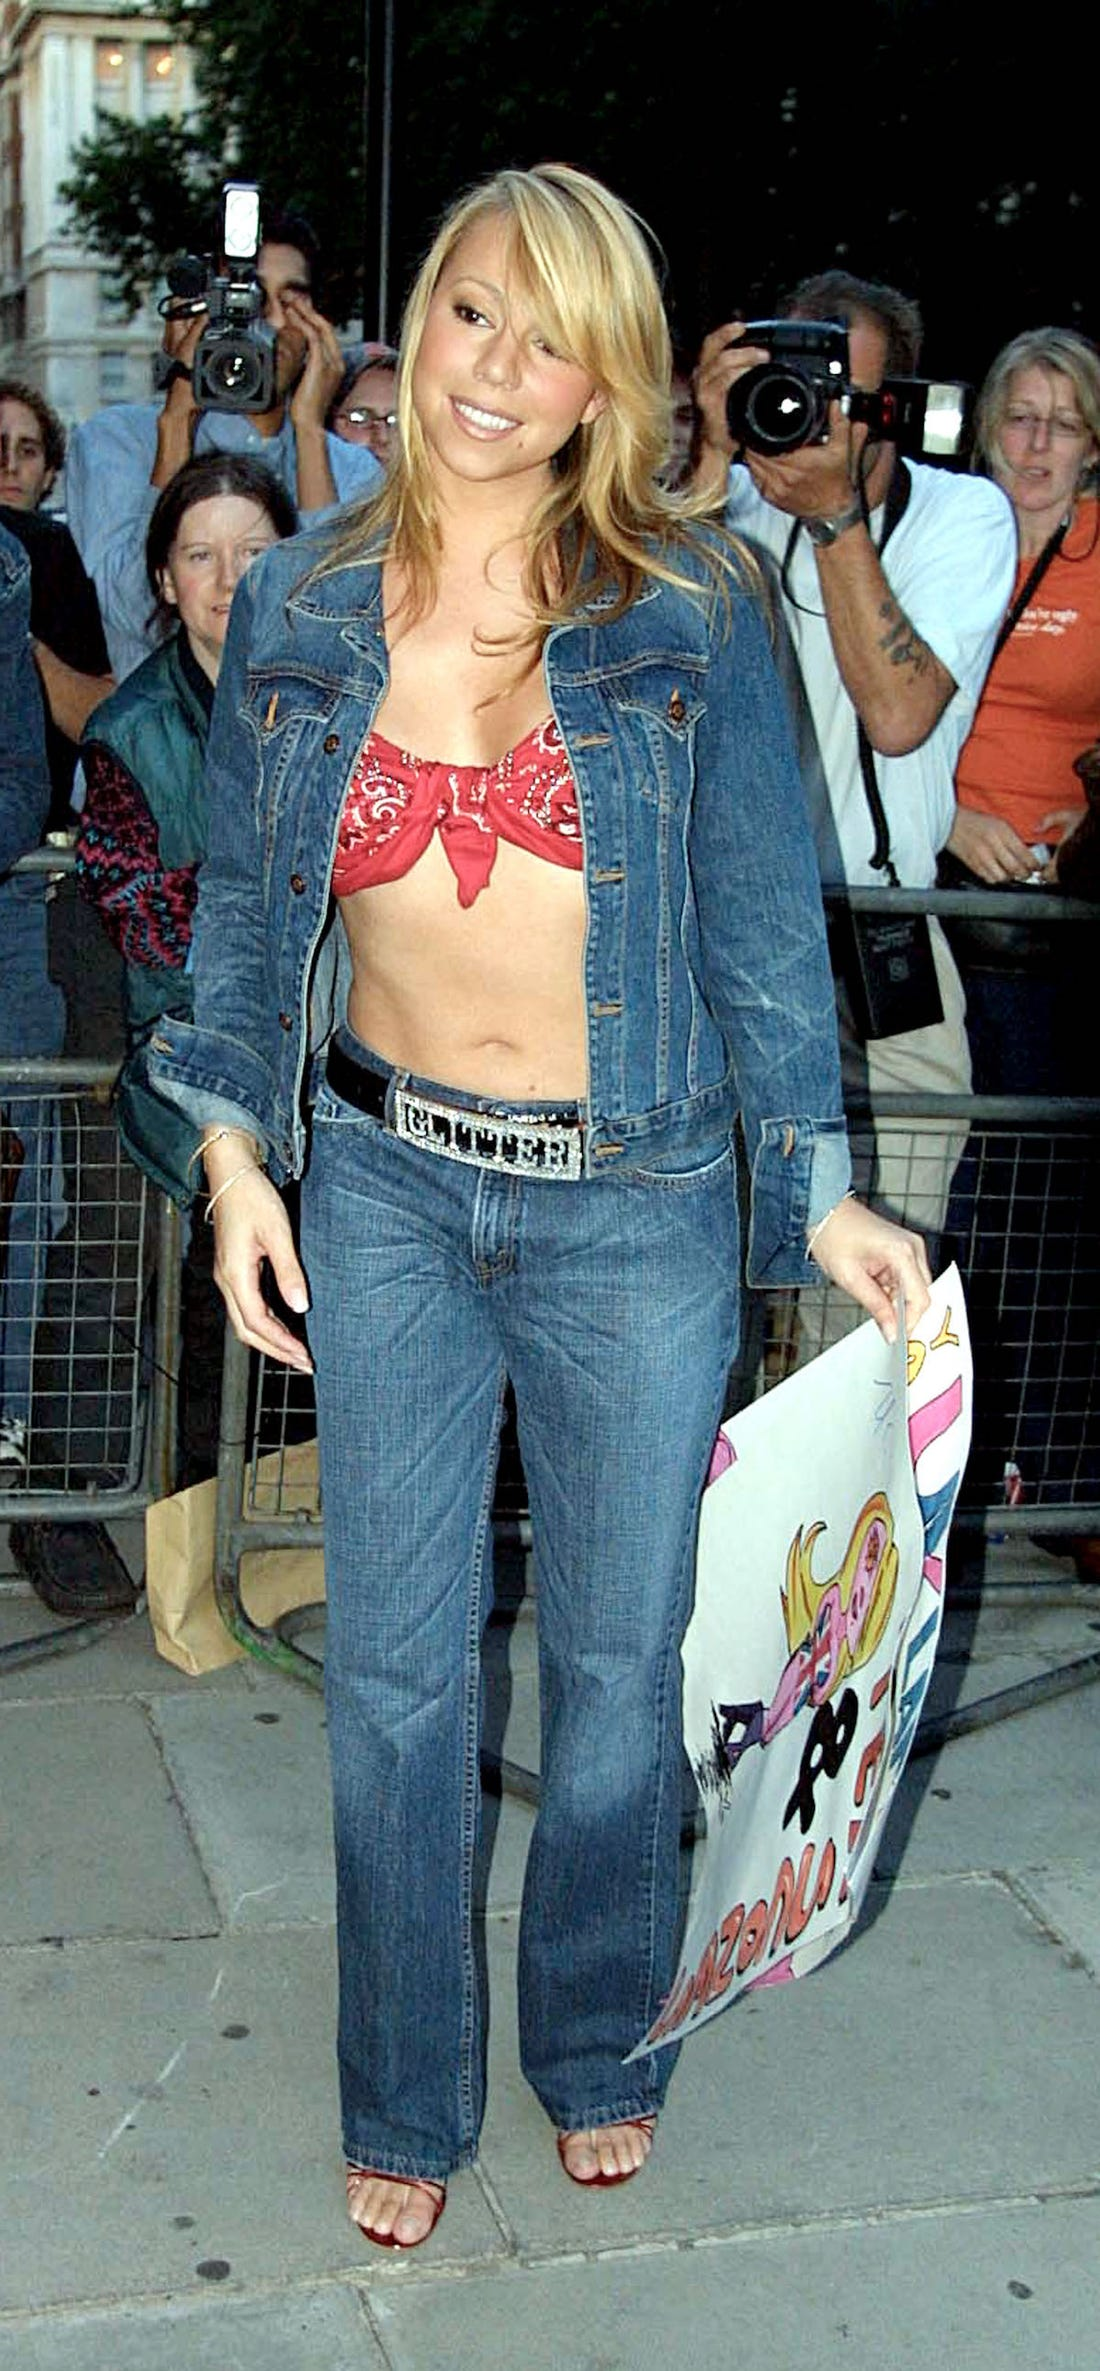 Mariah Carey wearing bandana top